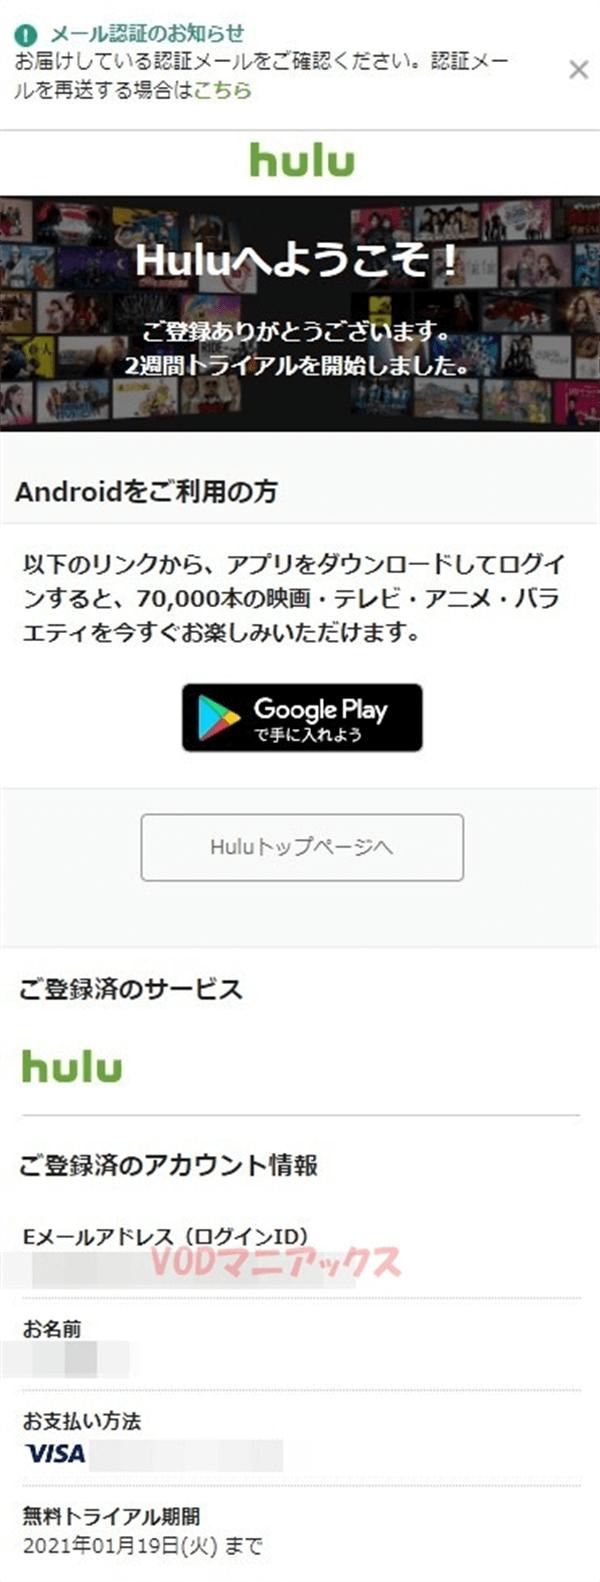 Hulu無料トライアル登録 完了